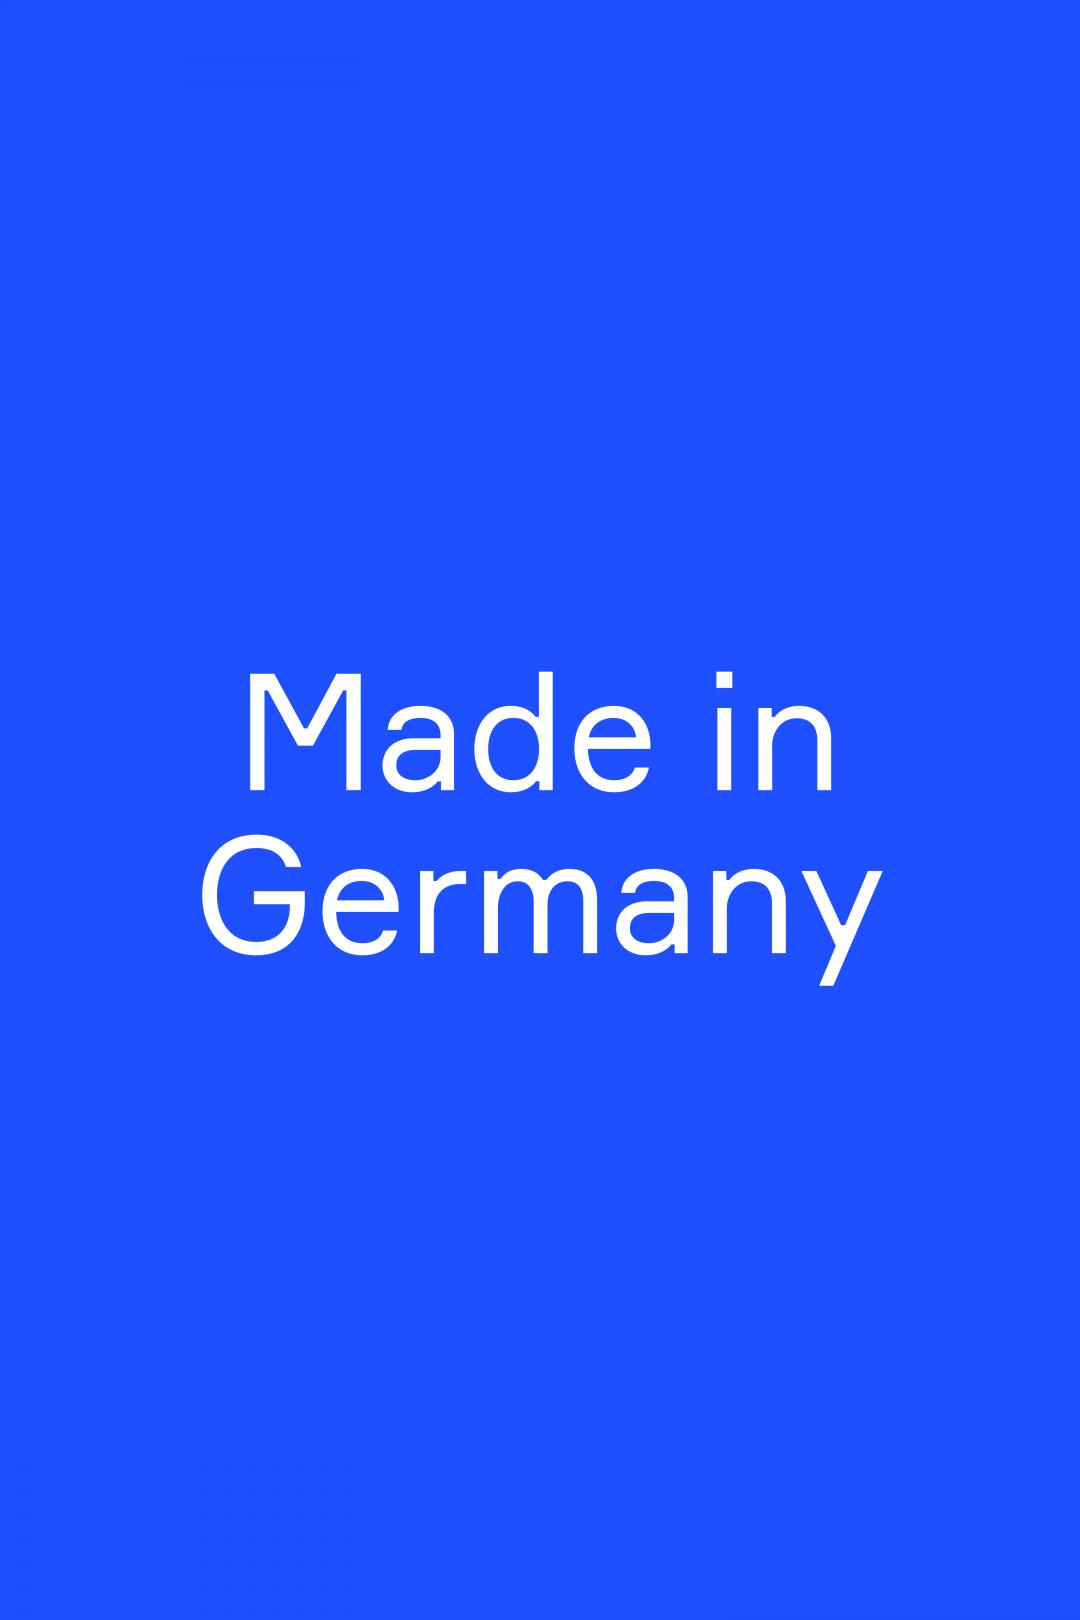 (German Bionic, Studio Leichtfried)